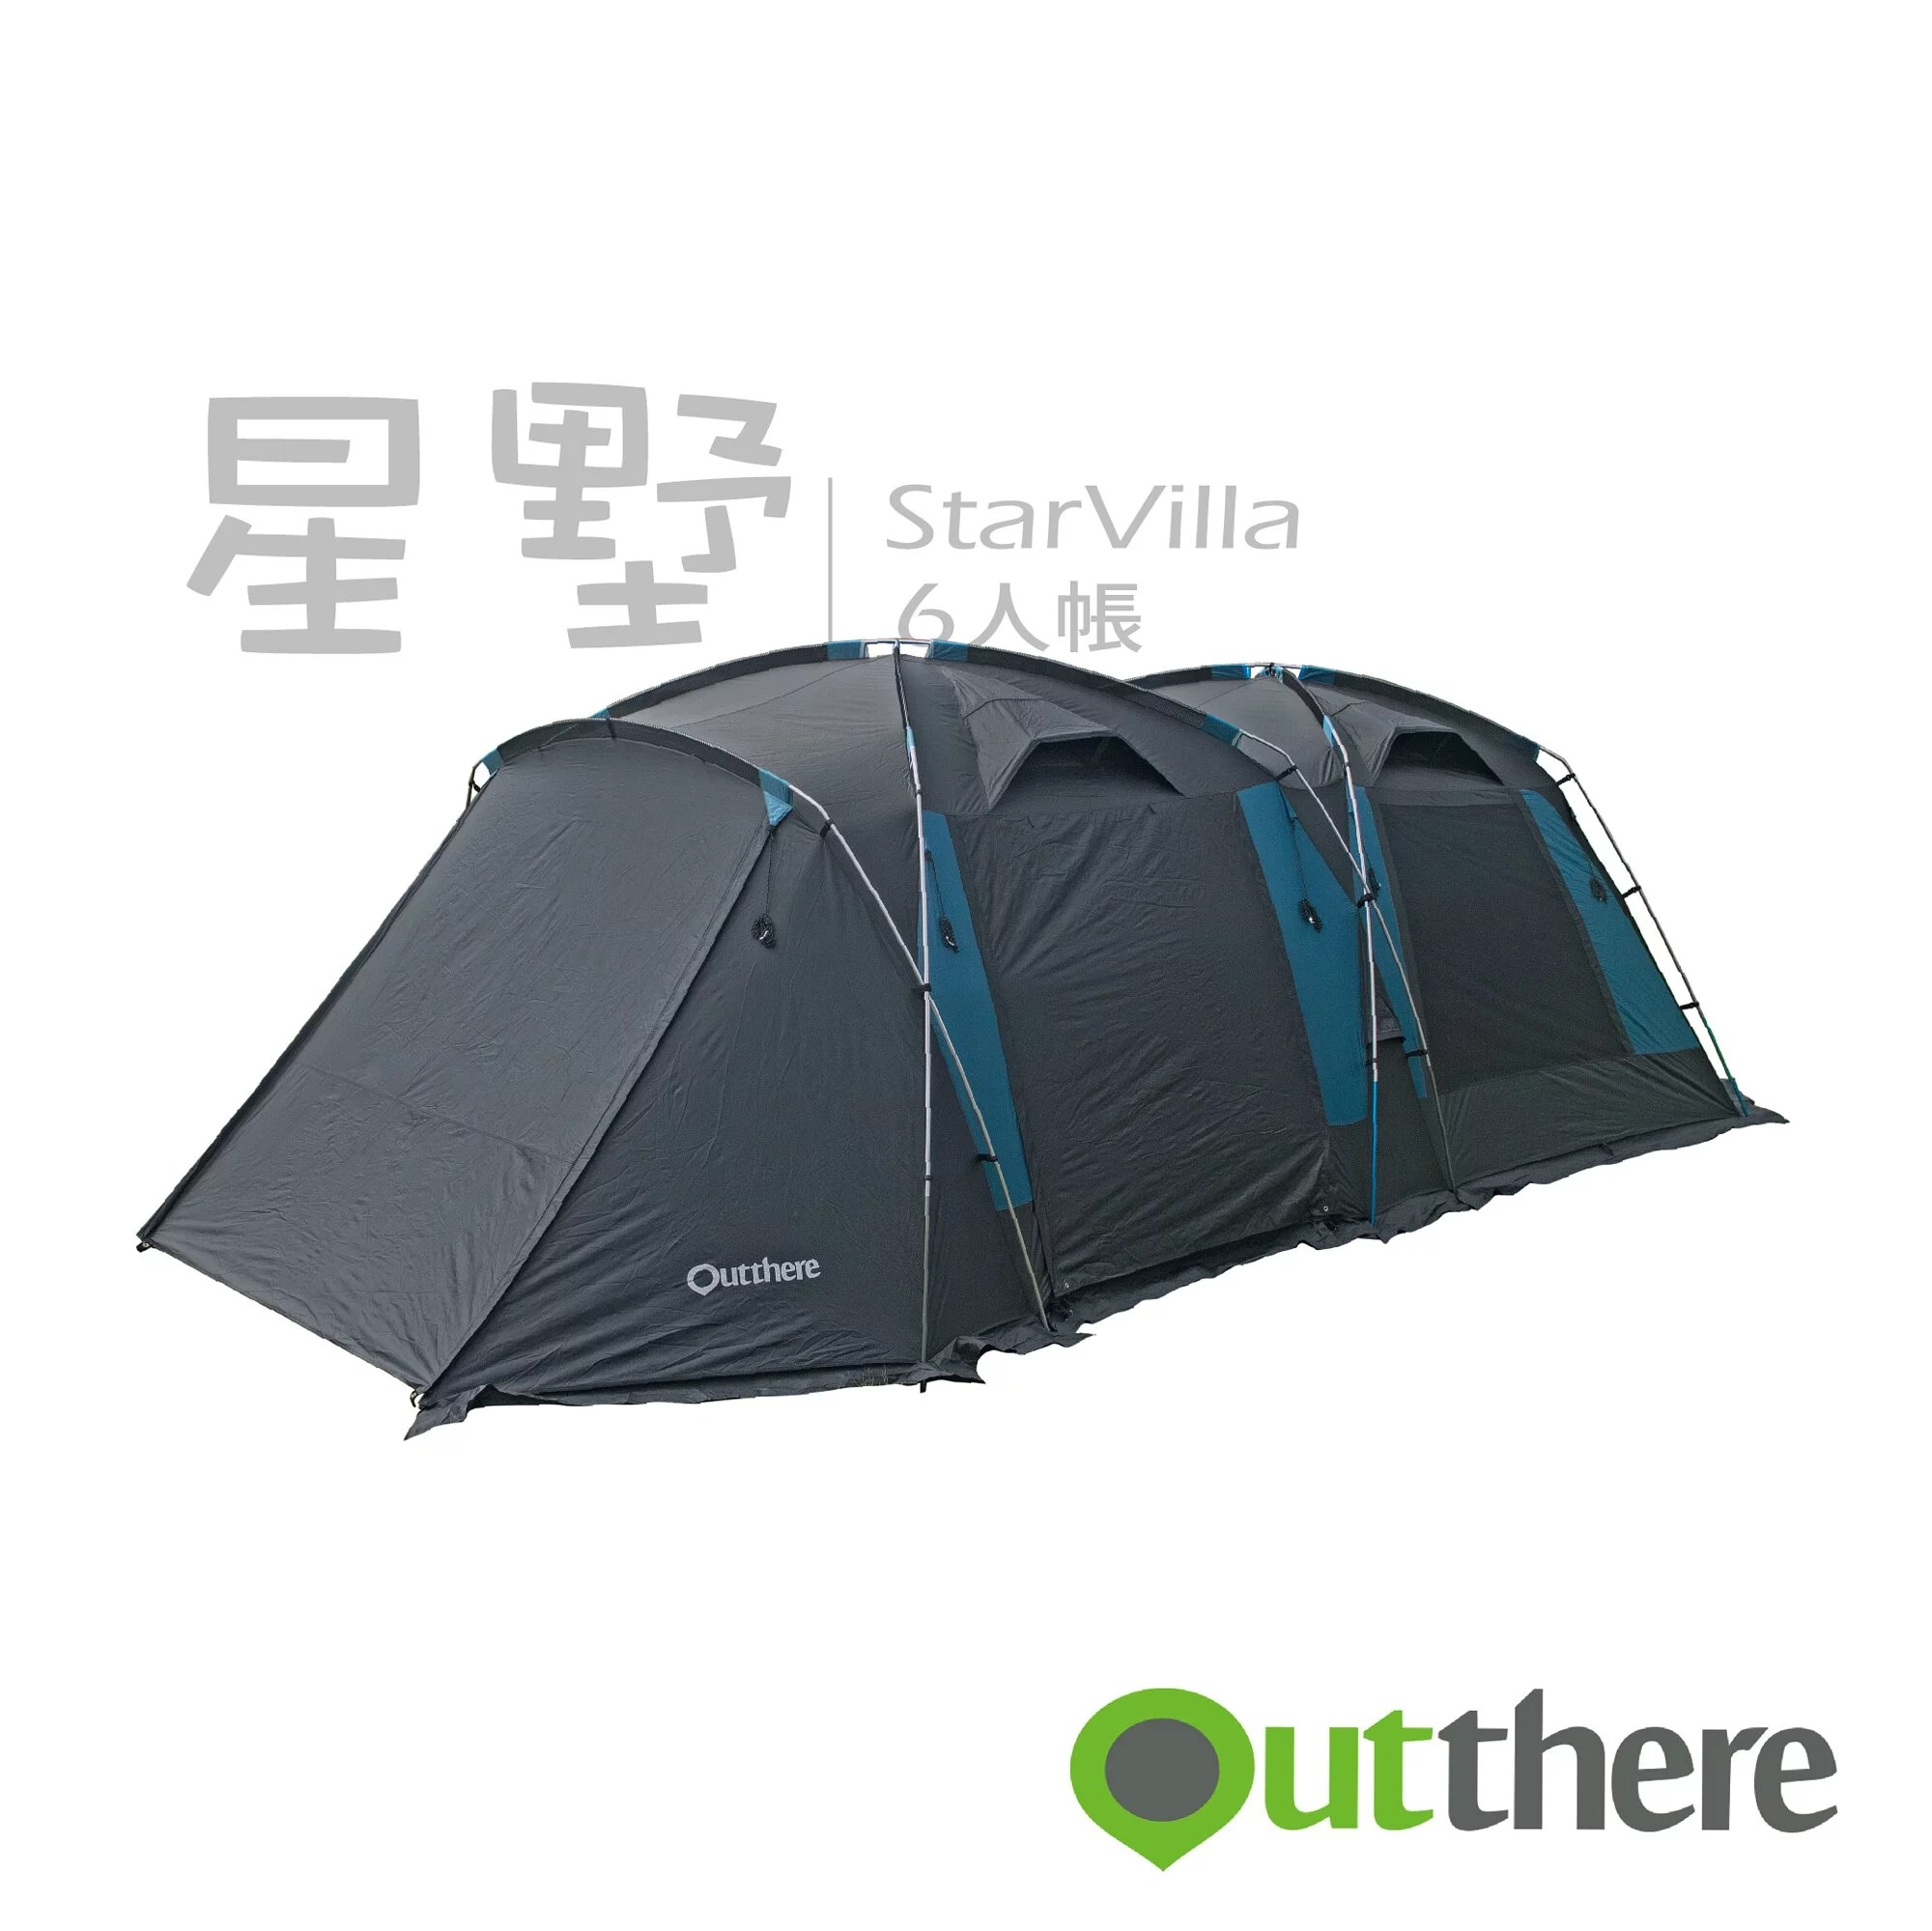 【Outthere 好野】StarVilla 星墅 豪华六人家庭帐 一房一厅 AD00609 帐篷/帐棚/登山露营